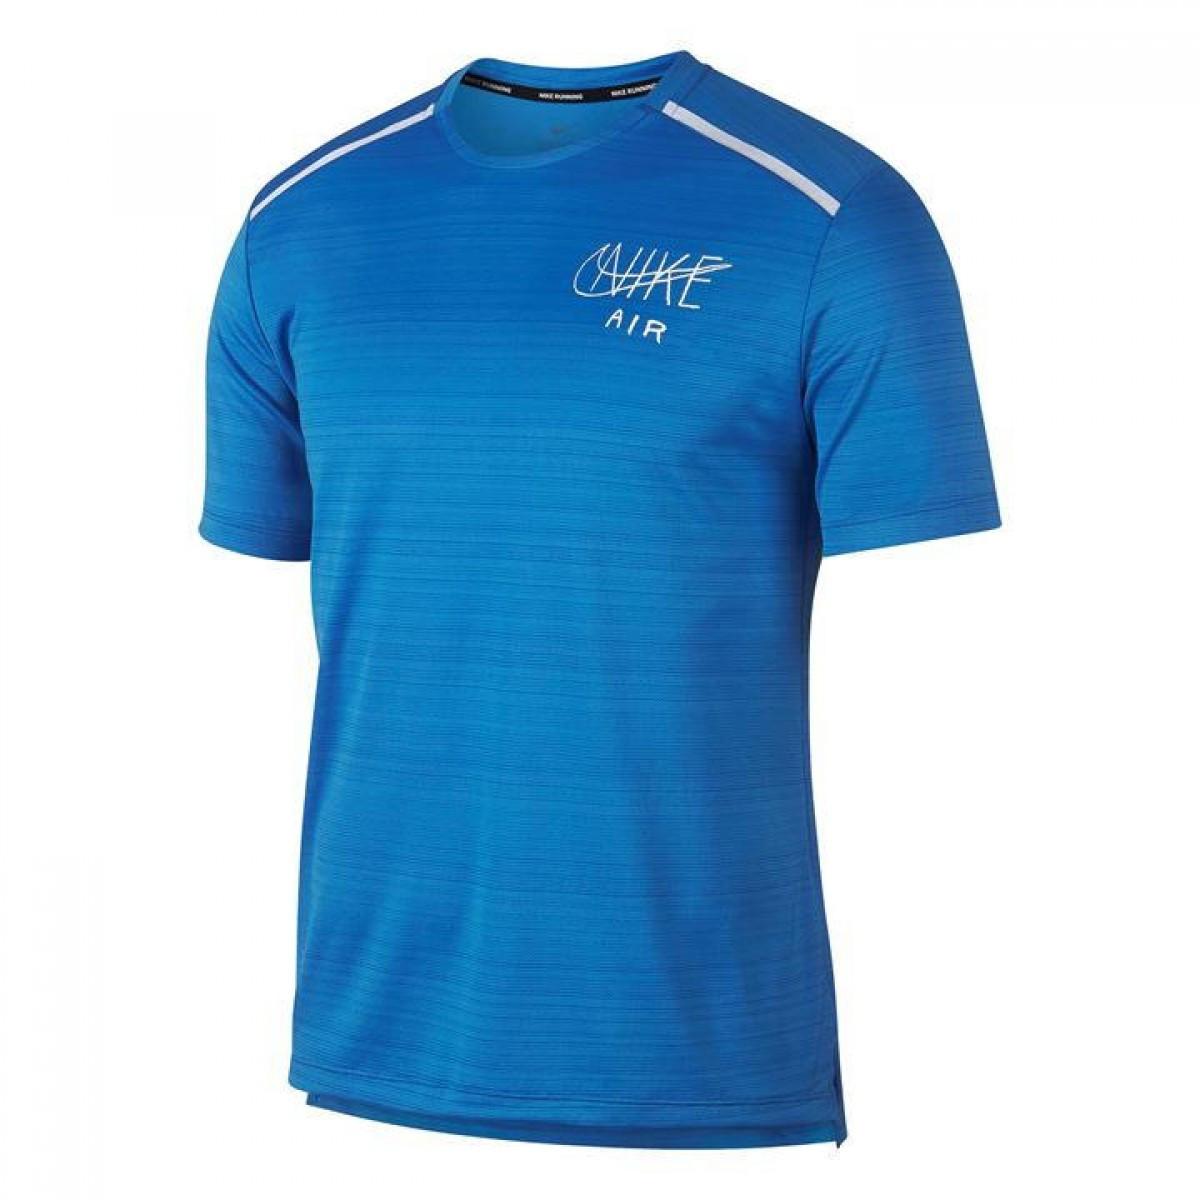 c8f4882b Футболка Nike Miler Graphic Running Blue/White - Оригинал — в ...